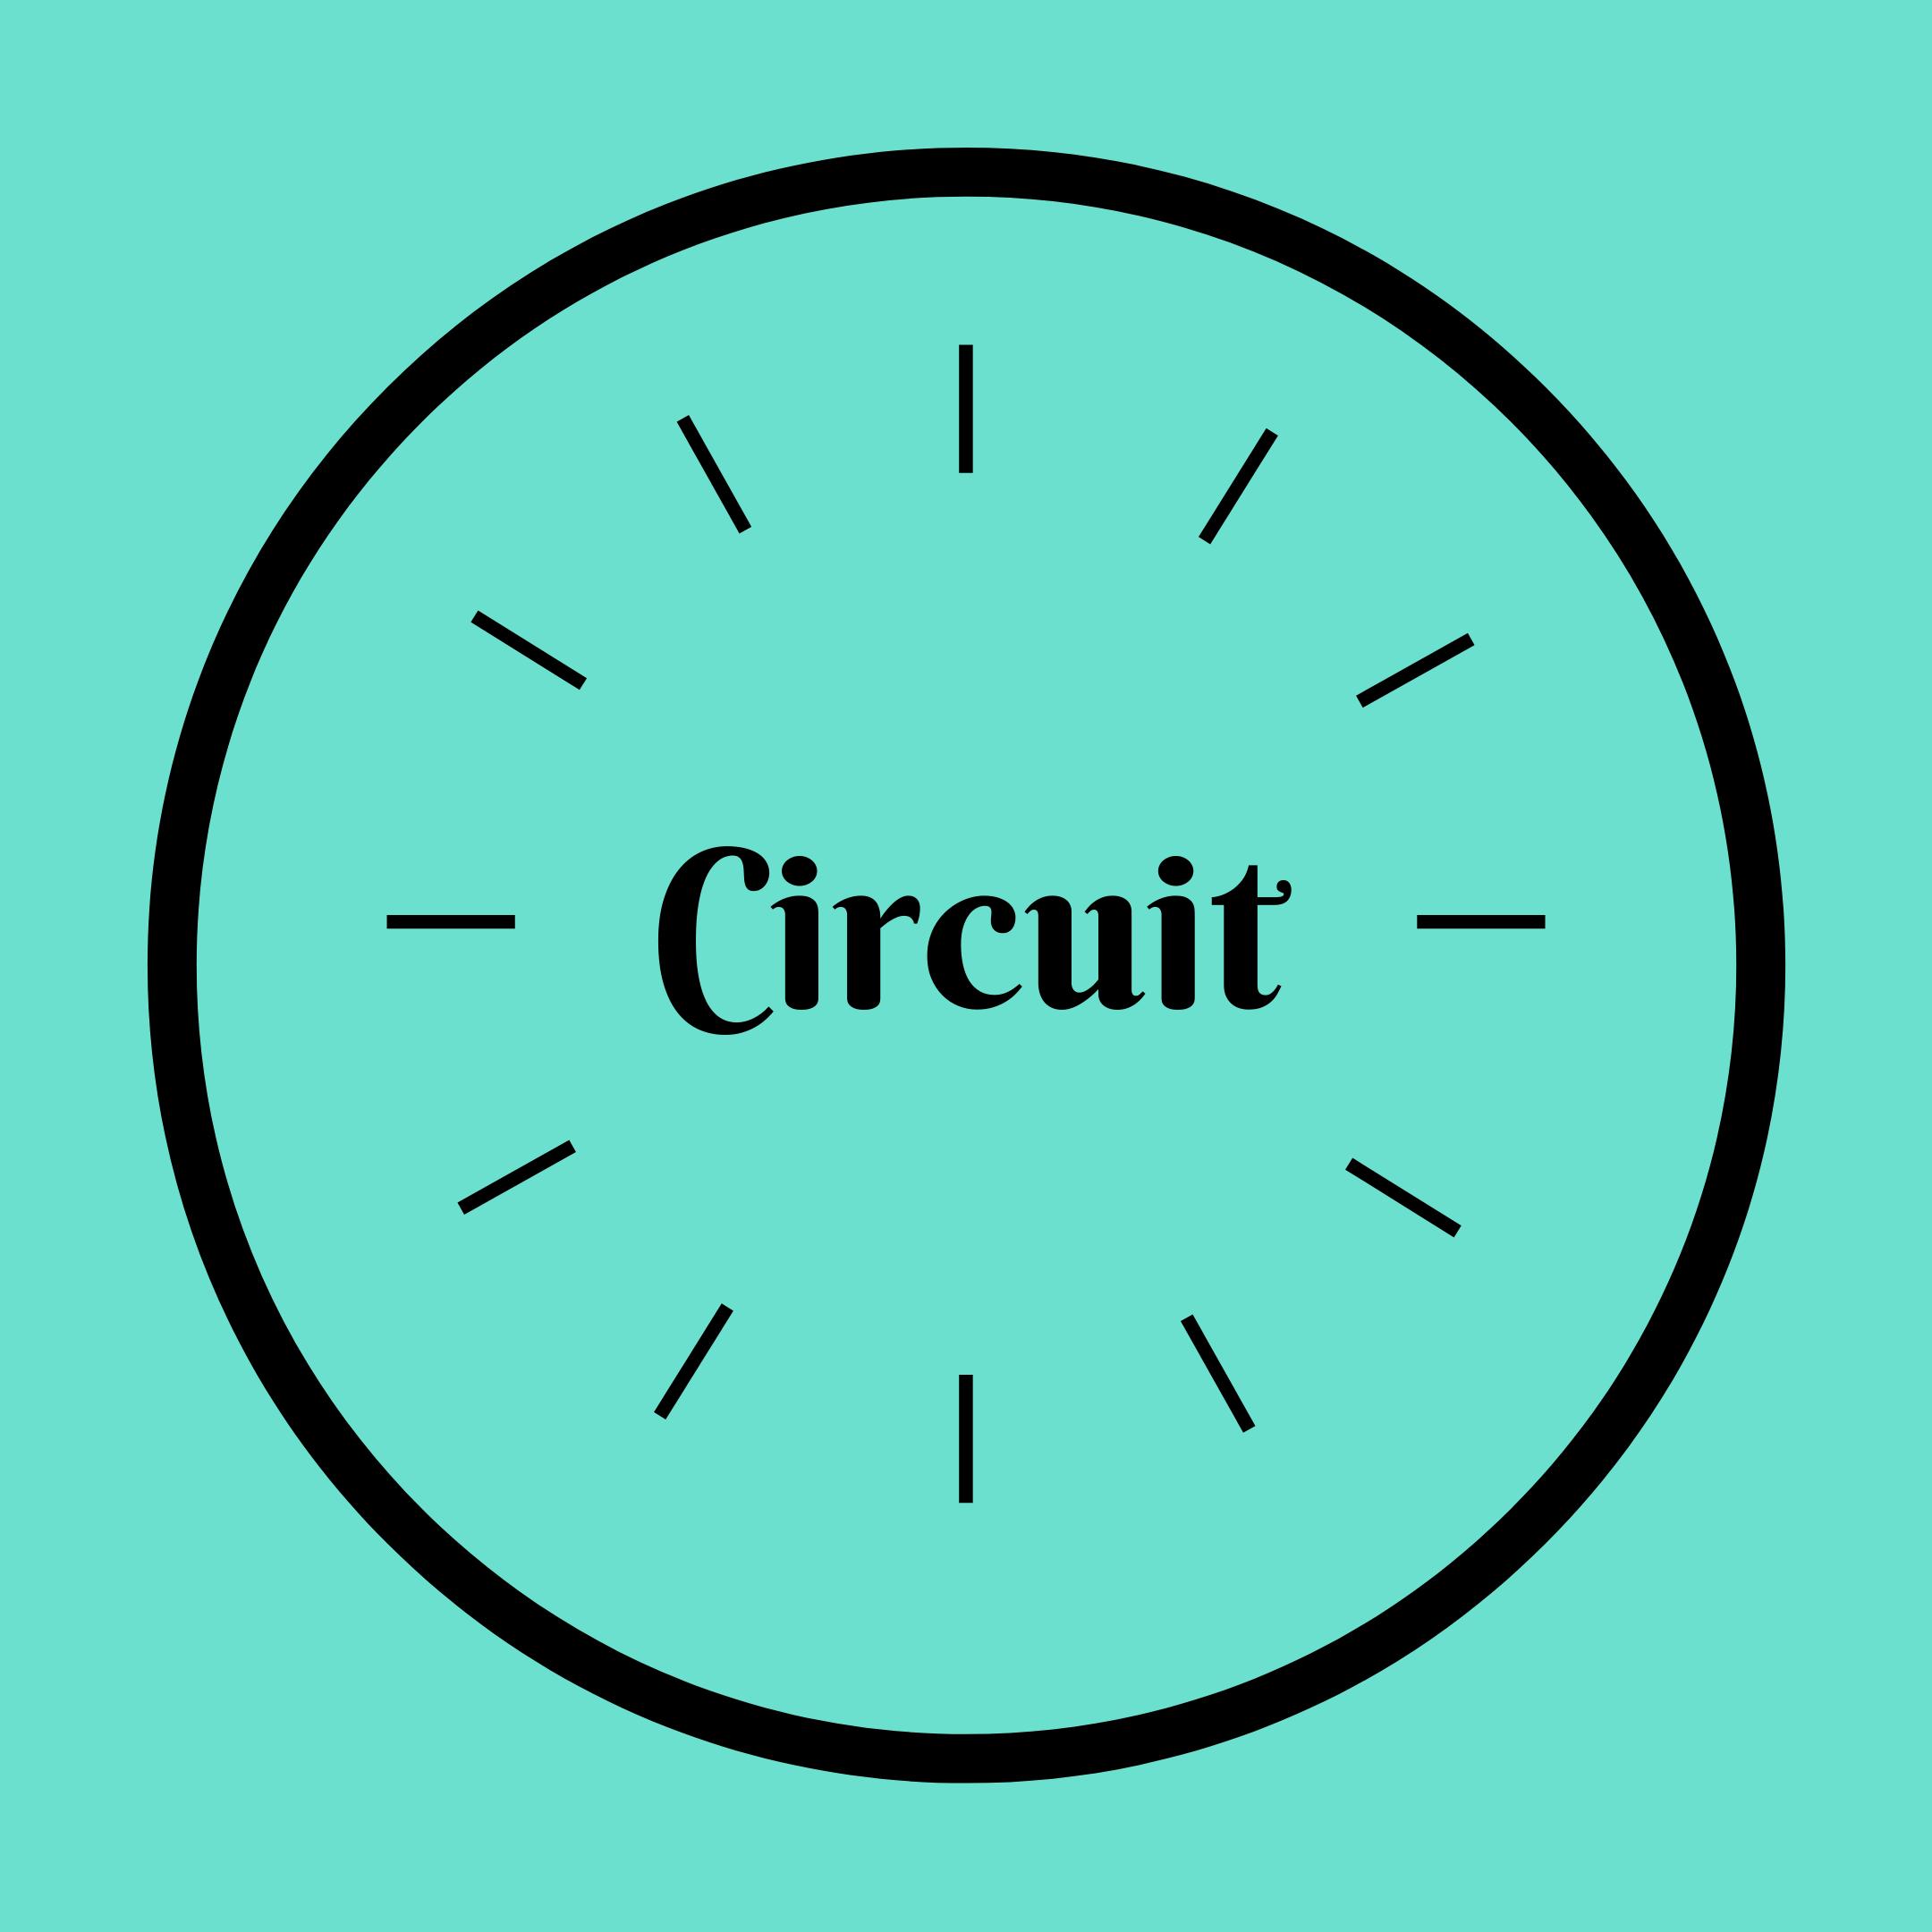 Circuit 6am